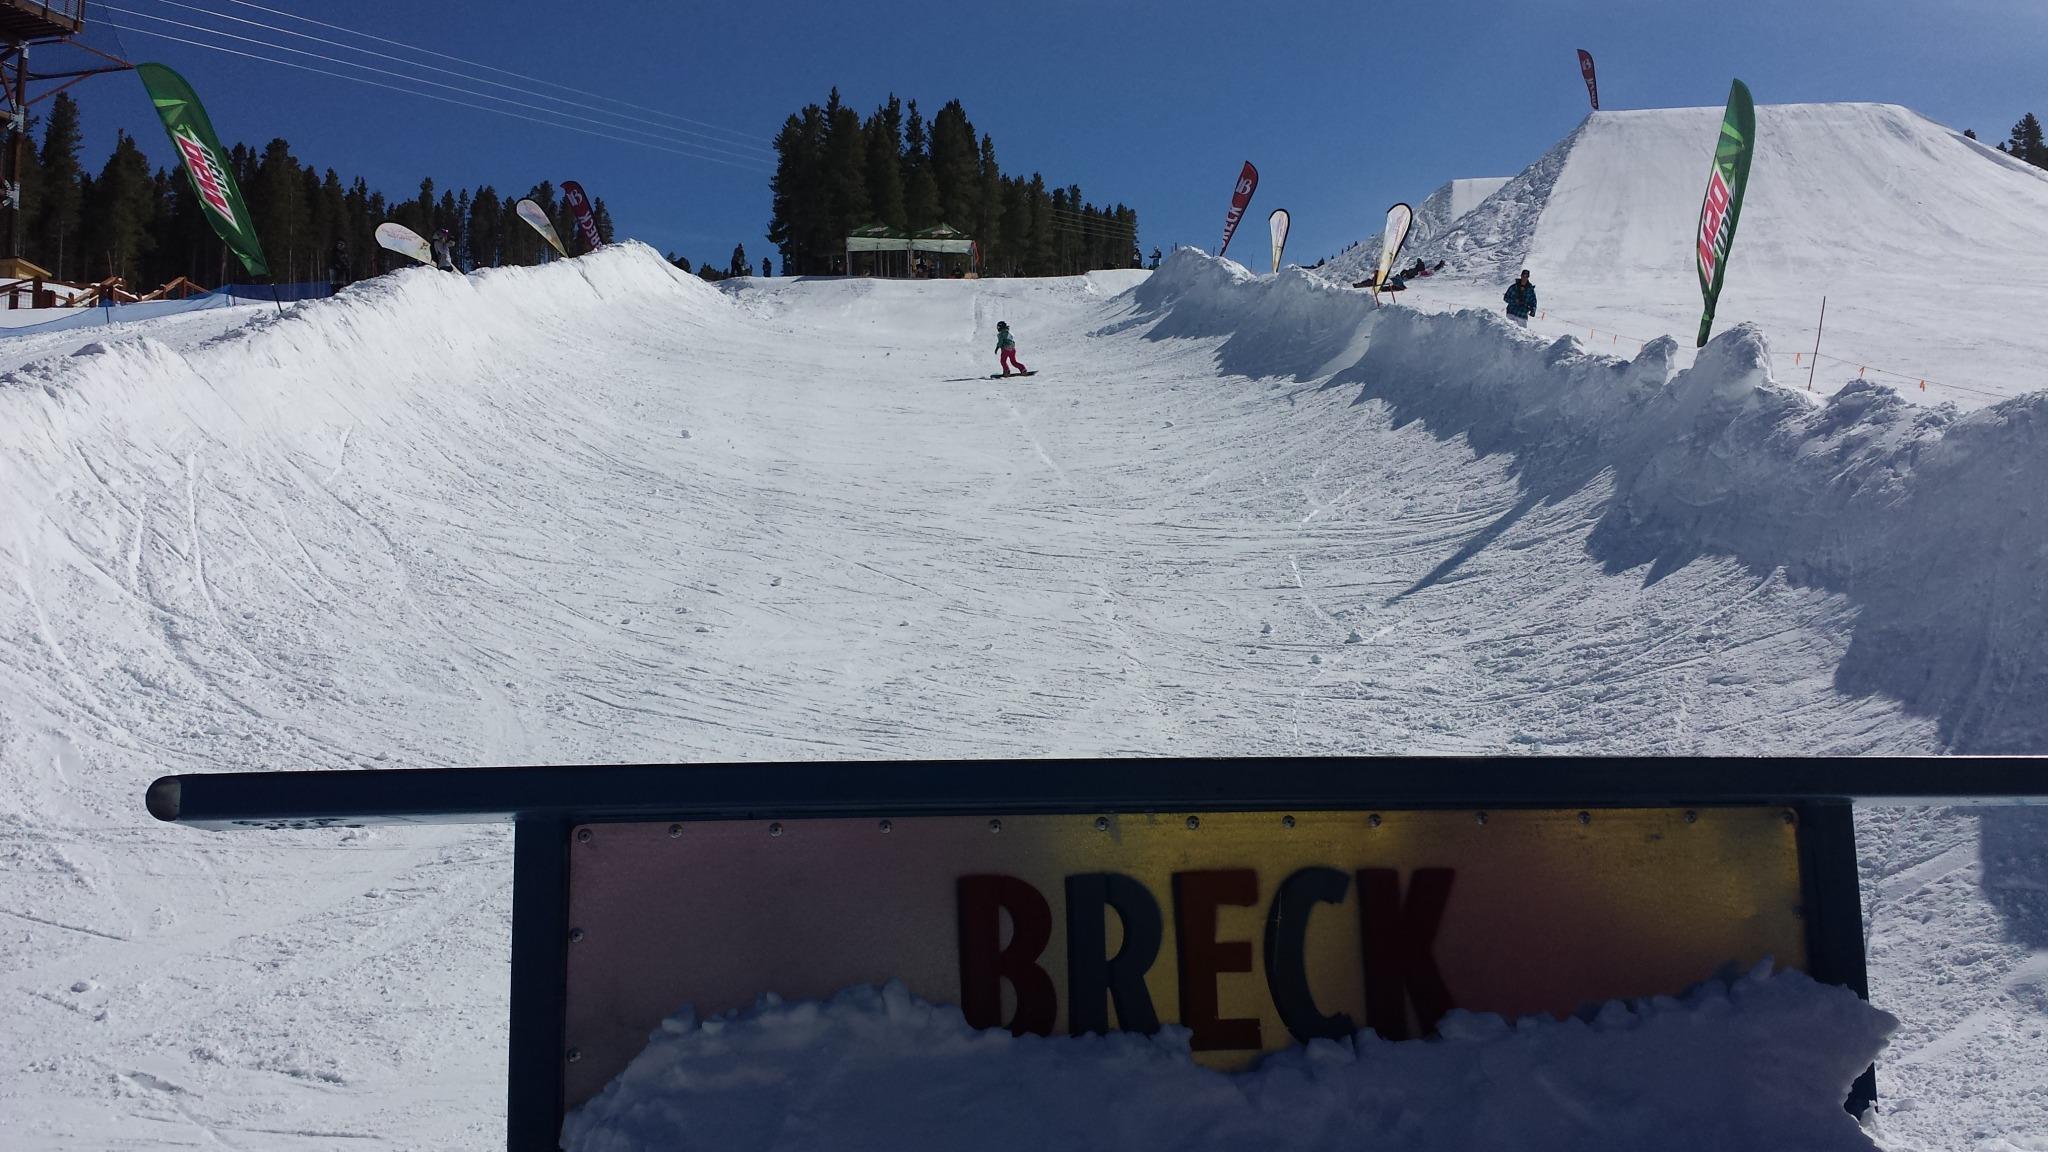 P: Breckenridge Resort